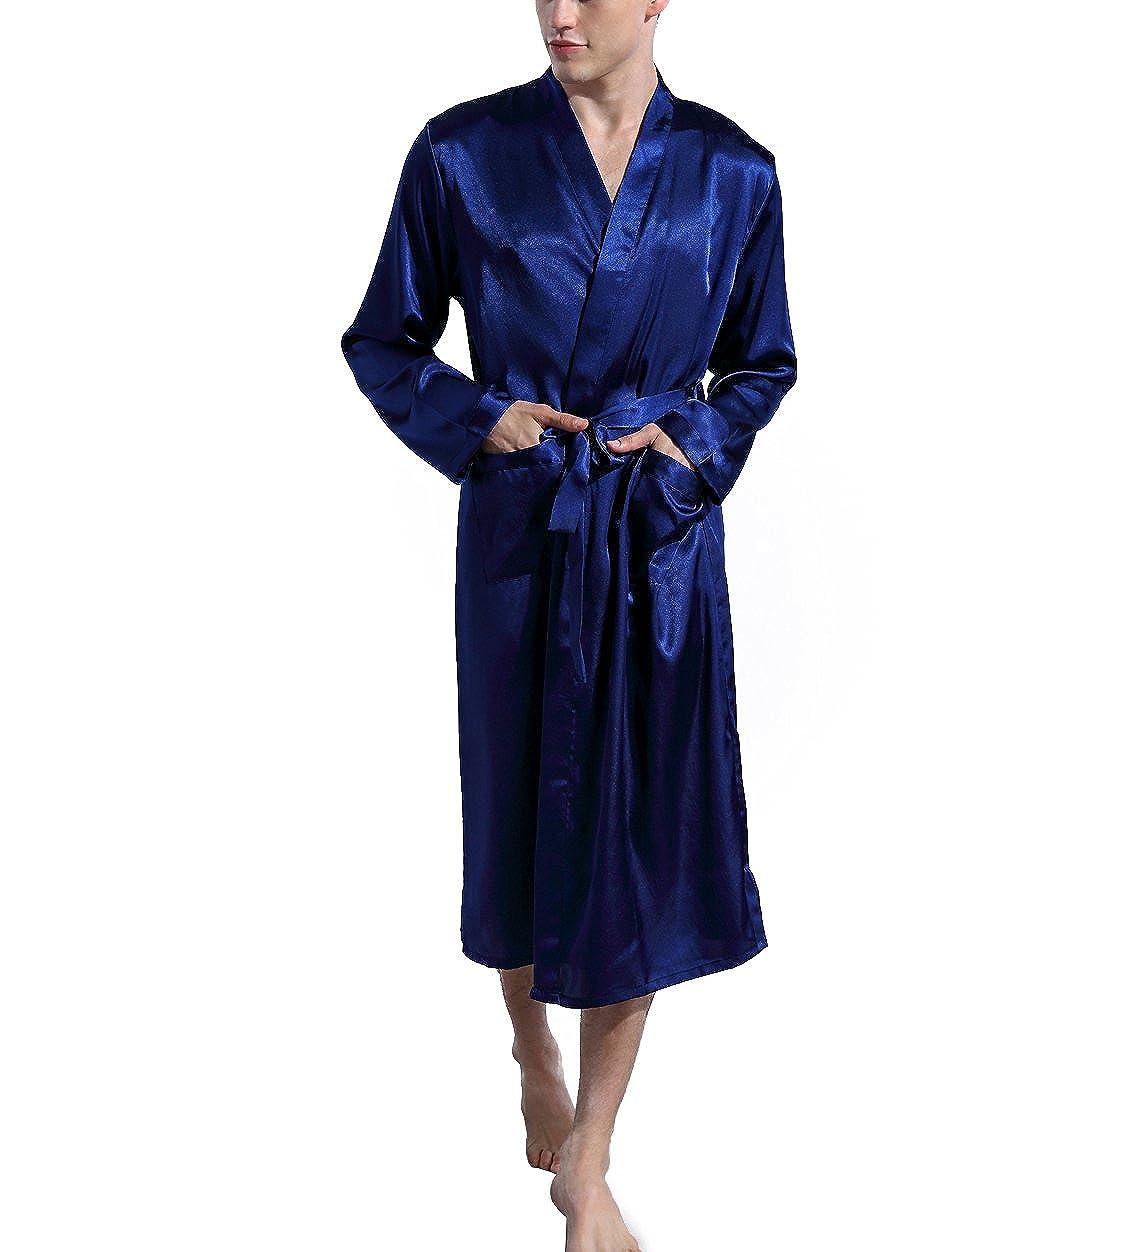 702c9498ac Admireme Men s Satin Kimono Robe Spa Bathrobes Loungewear Sleepwear Long  Bathrobe Lightweight Silk Nightwear at Amazon Men s Clothing store